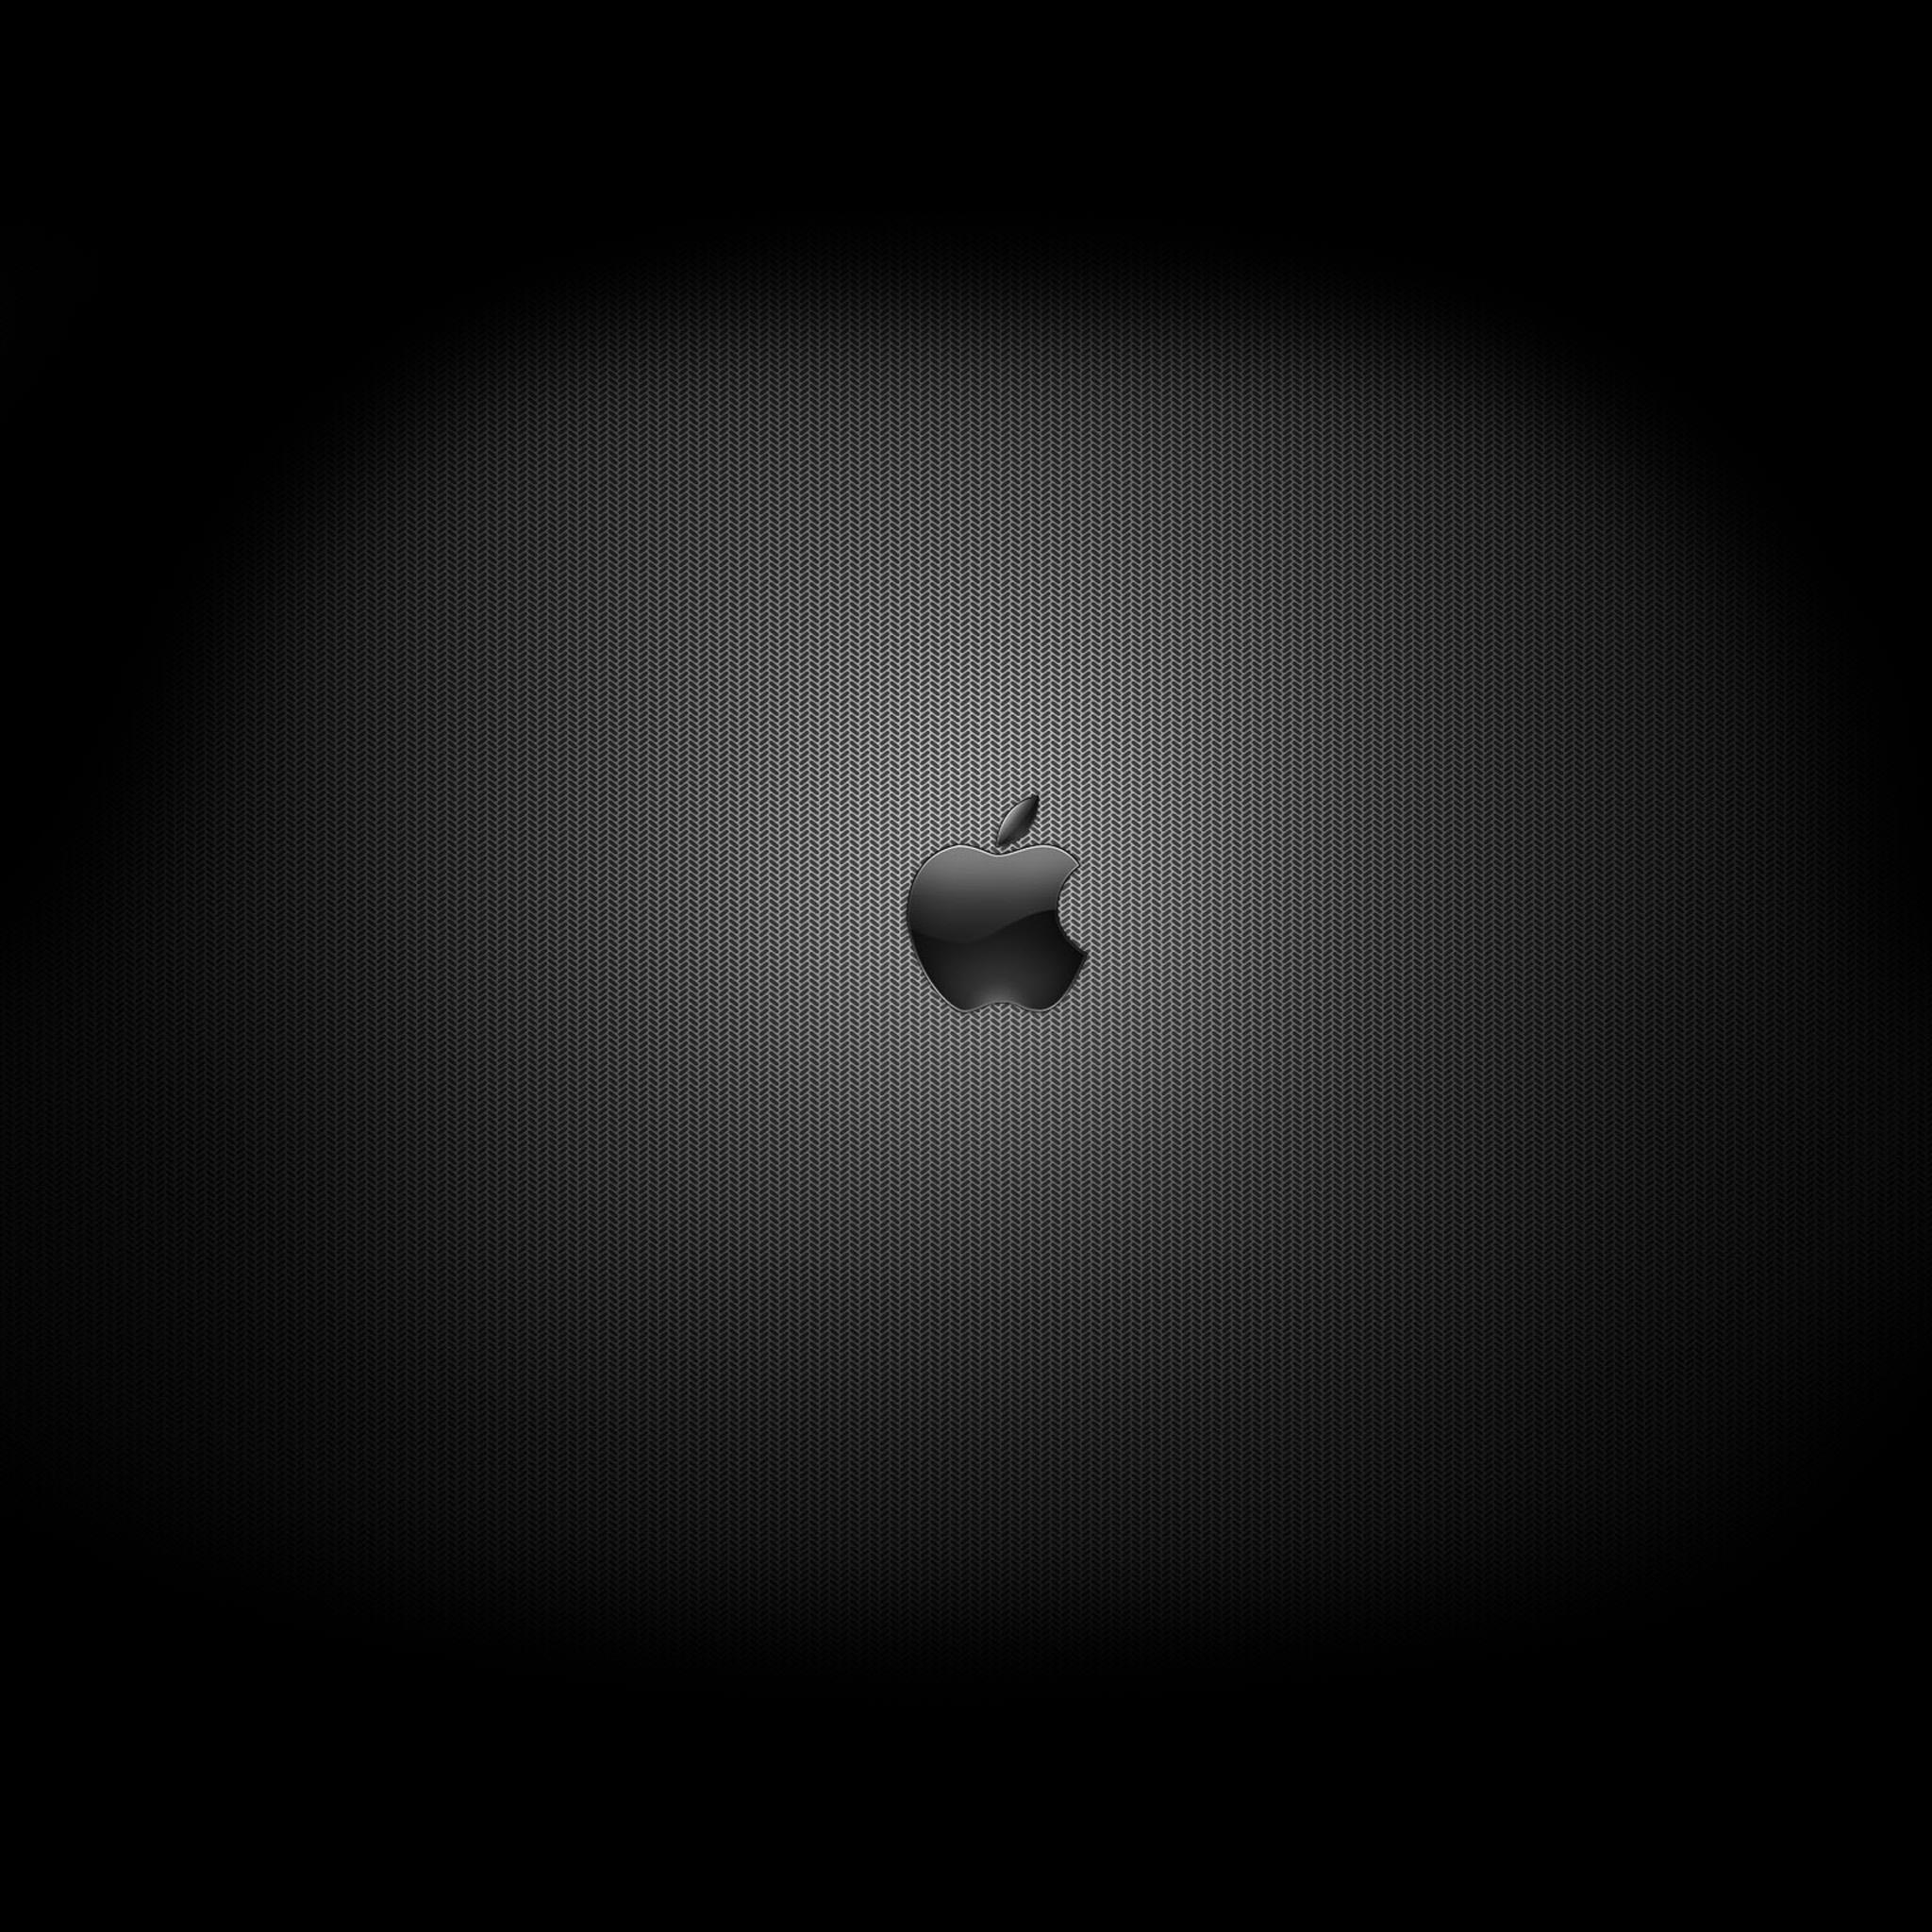 Dark-Apple-Logo-3Wallpapers-iPad-Retina